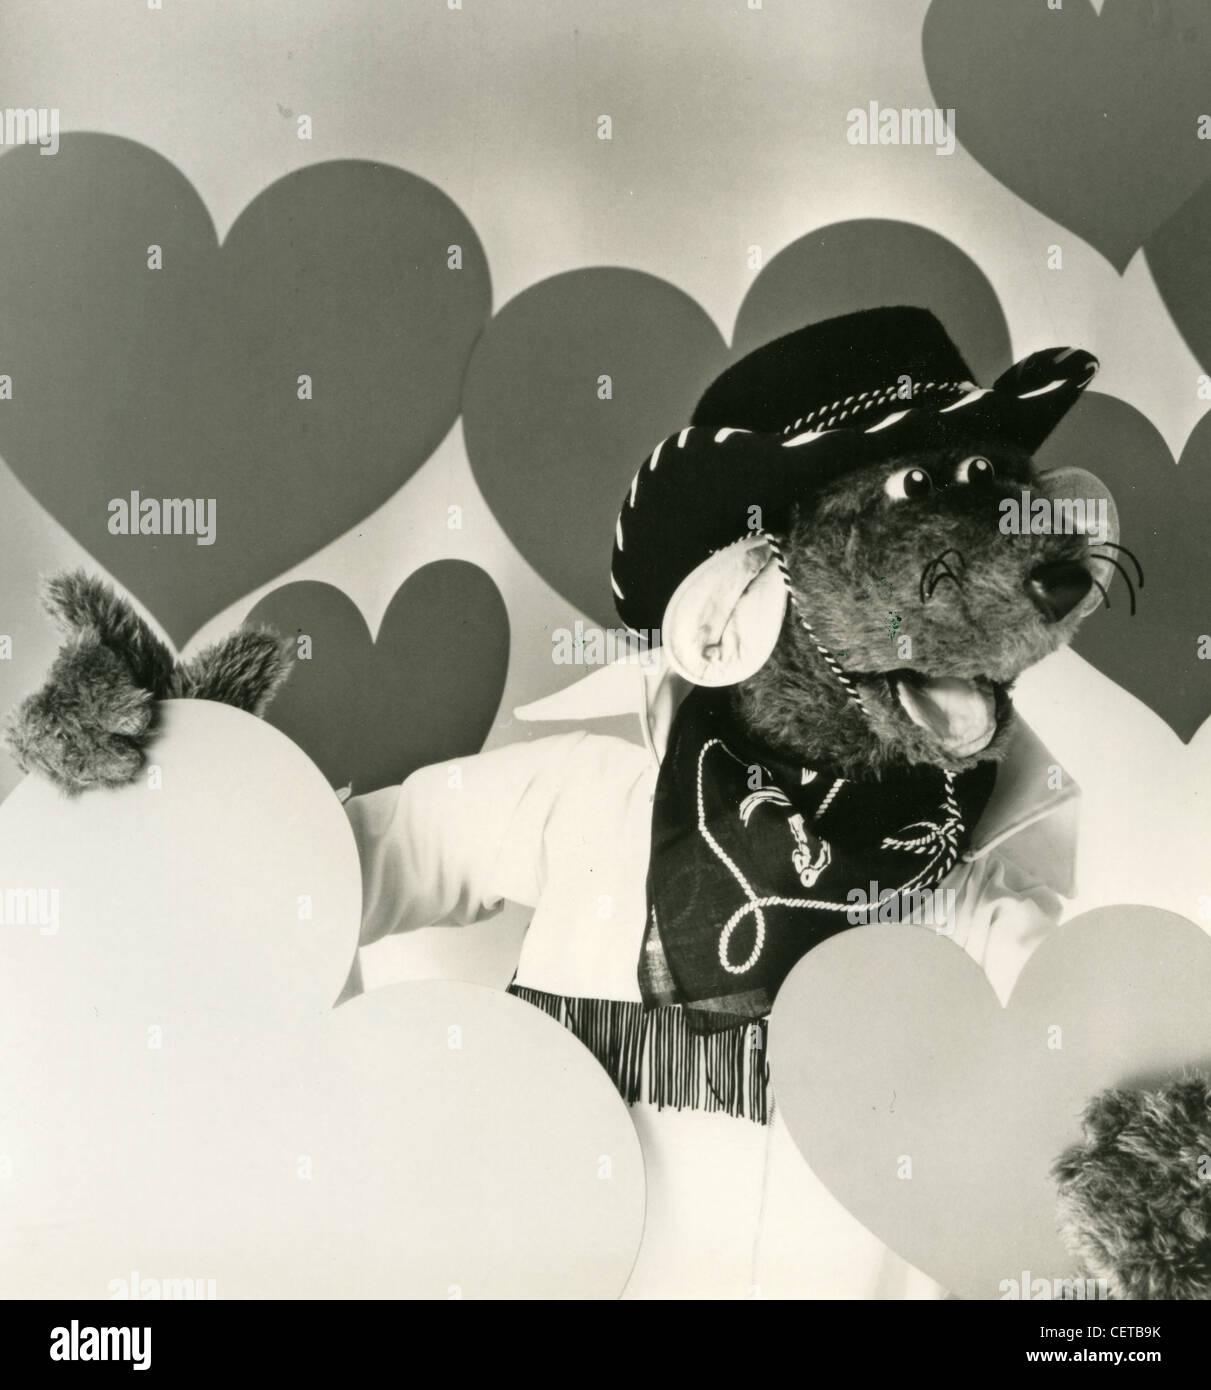 ROLAND RAT  Promotional photo of UK TV puppet character - Stock Image